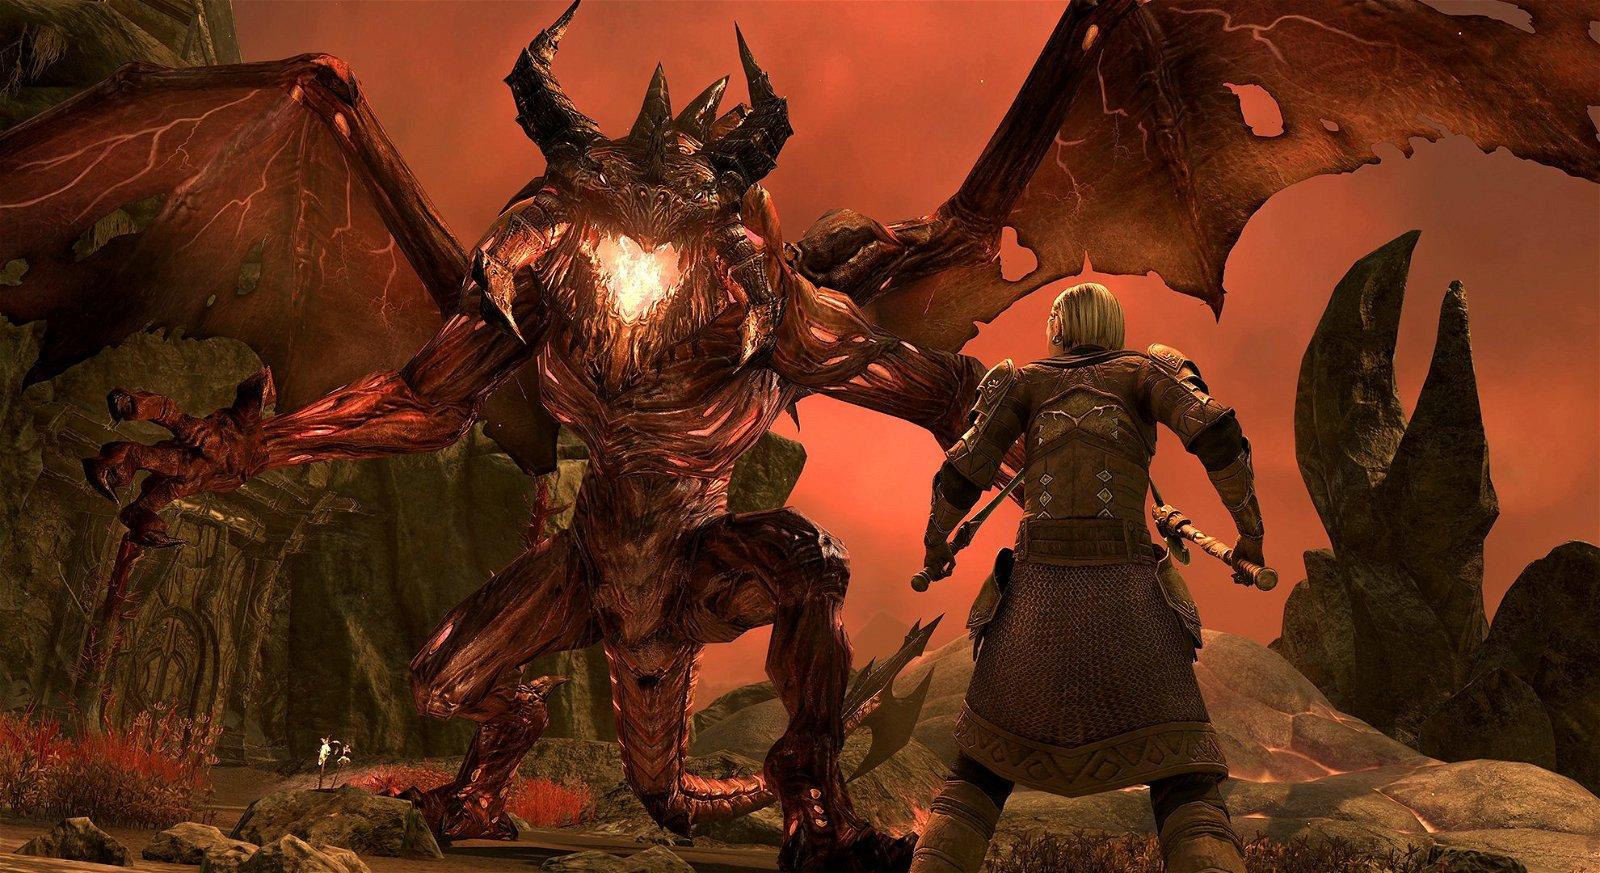 Elder Scrolls Online: Blackwood (PC) Preview